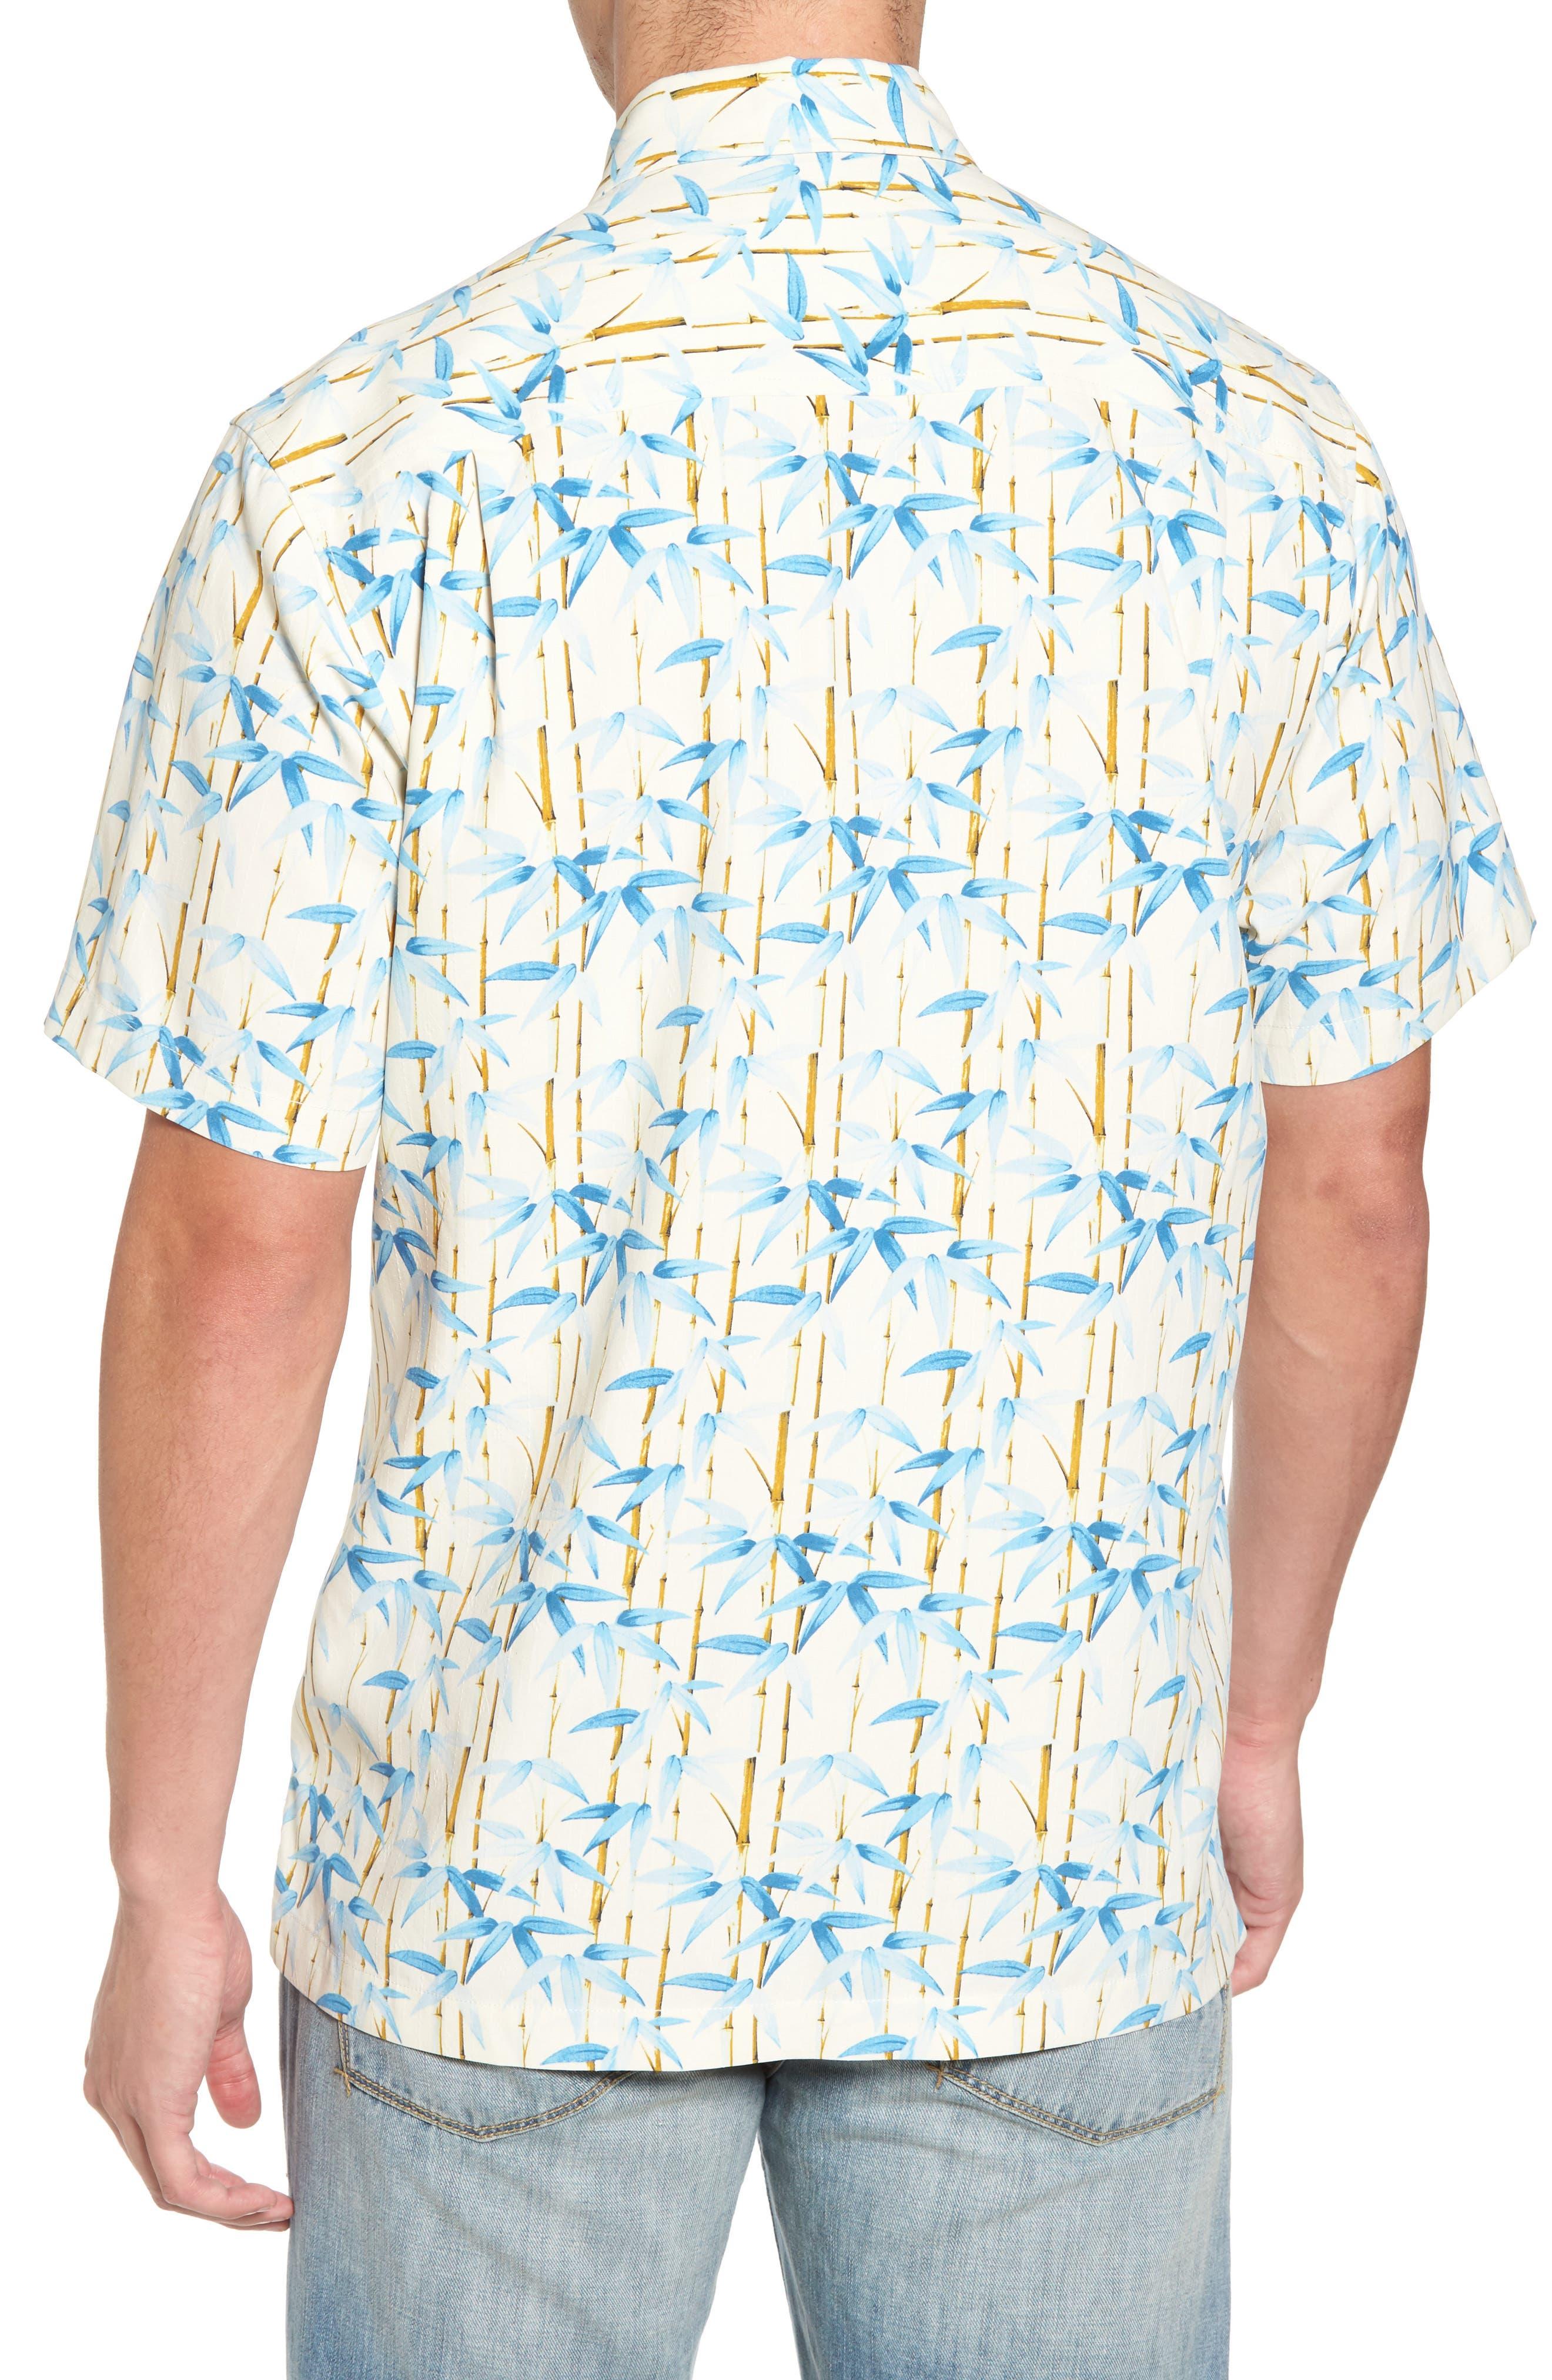 TOMMY BAHAMA,                             Forest Print Silk Sport Shirt,                             Alternate thumbnail 2, color,                             100